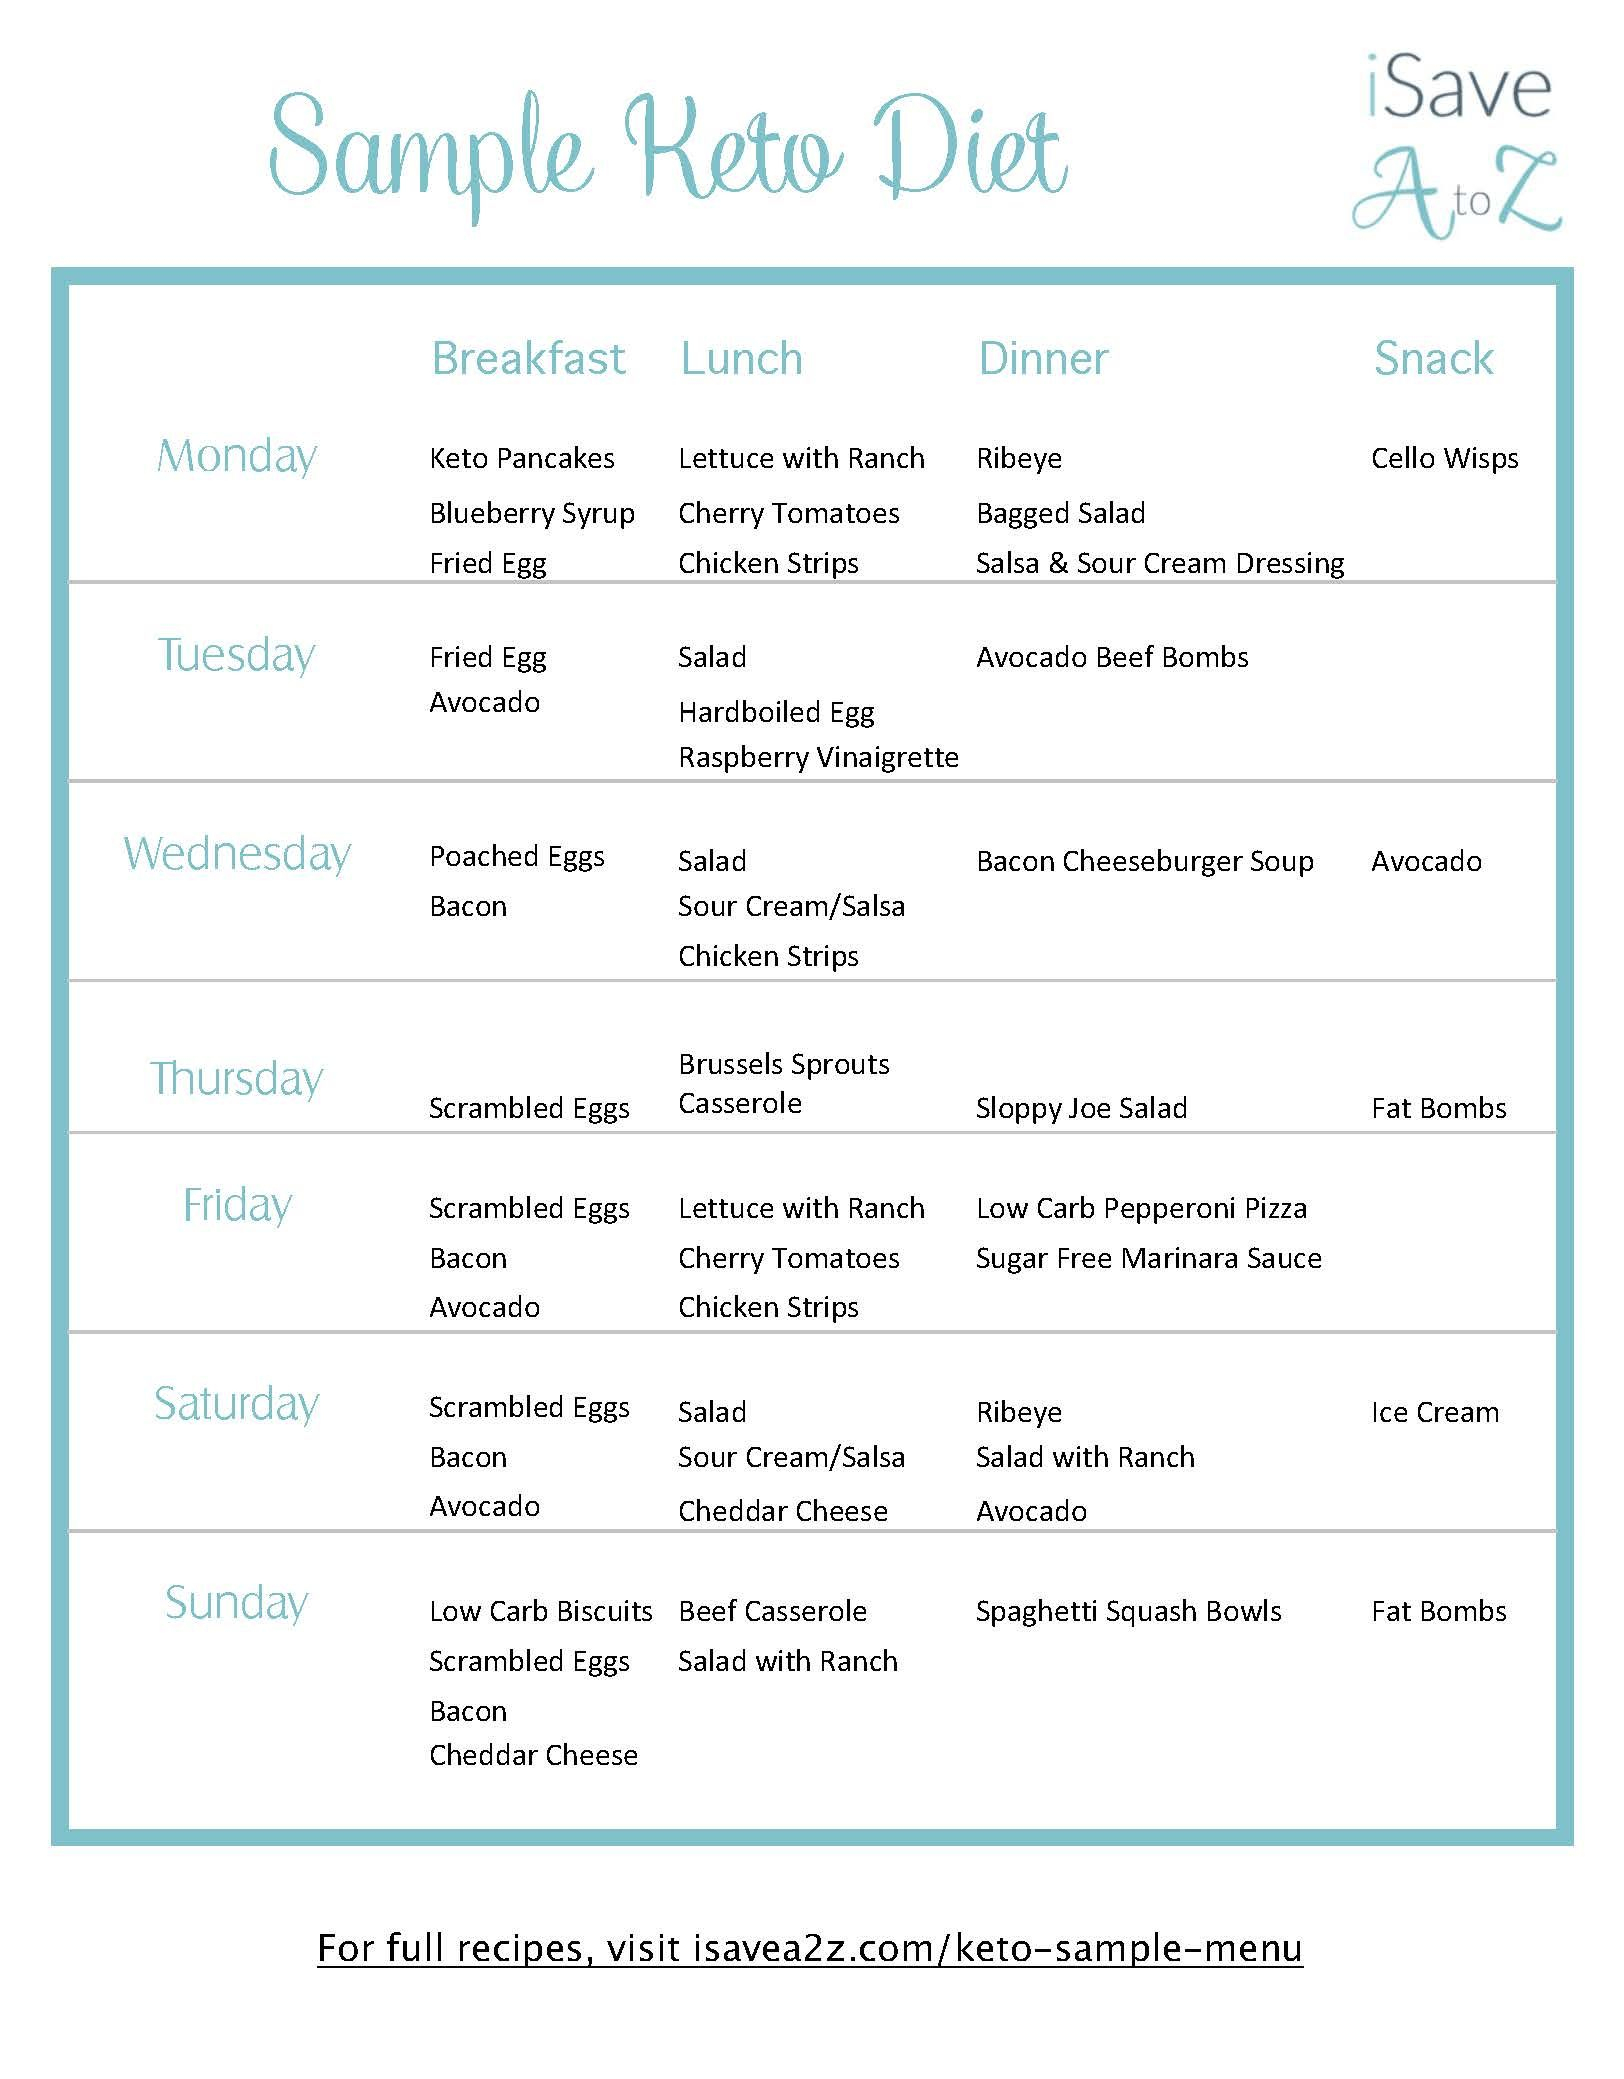 Grab This Printable 7 Day Keto Sample Menu Plan | Recipes - Free Printable Low Carb Diet Plans